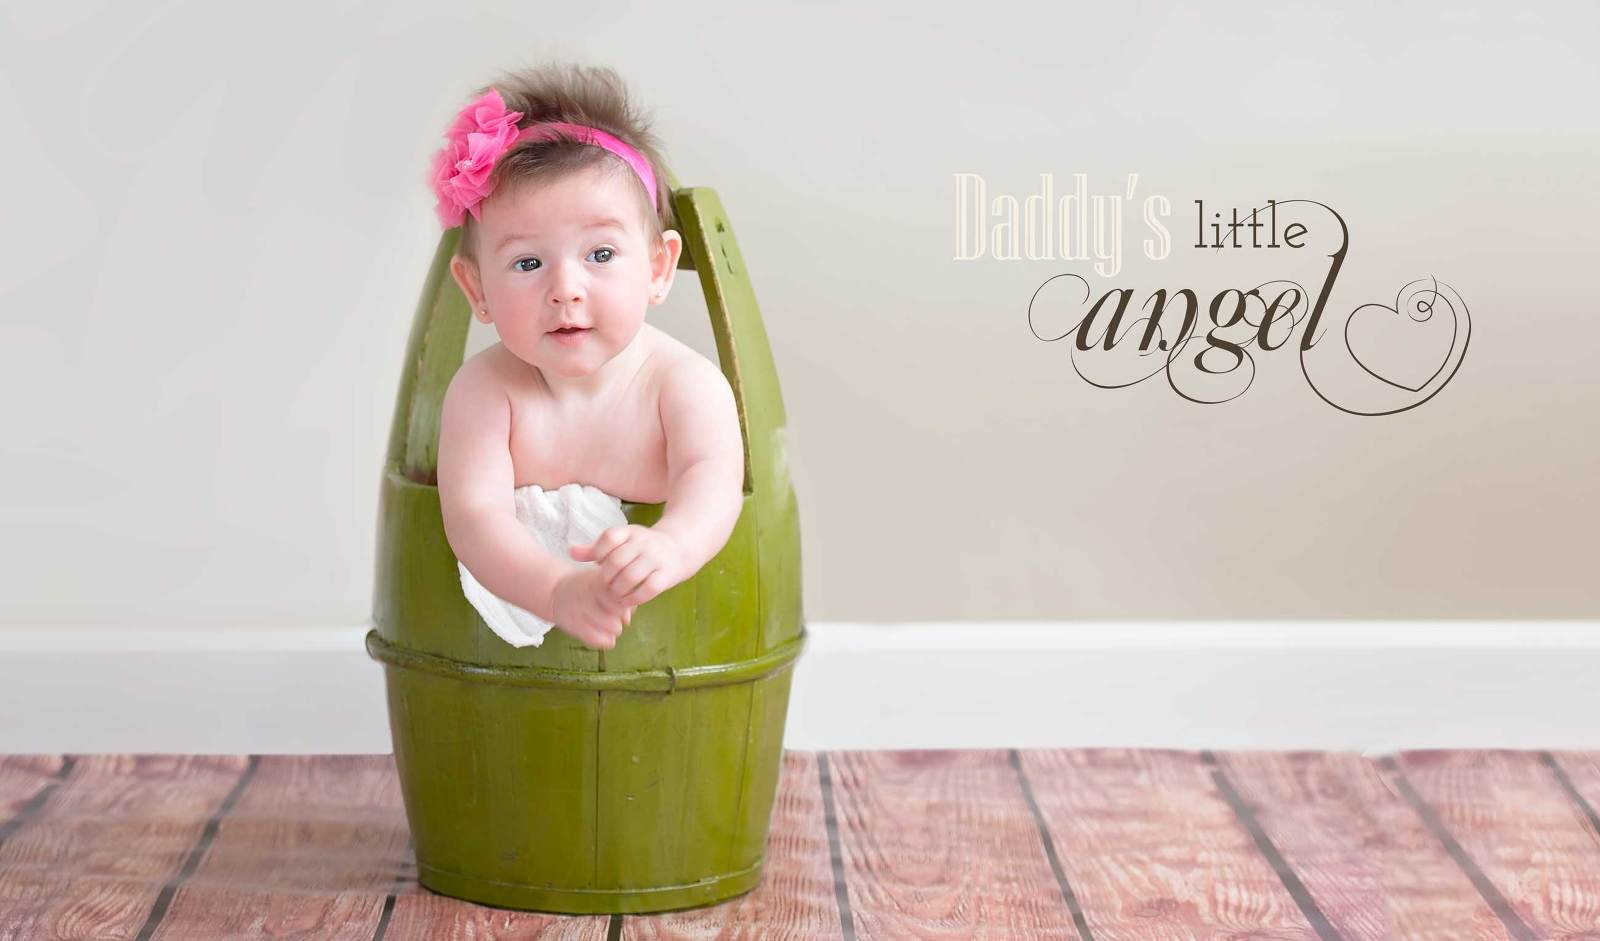 A baby girl inside a green bucket